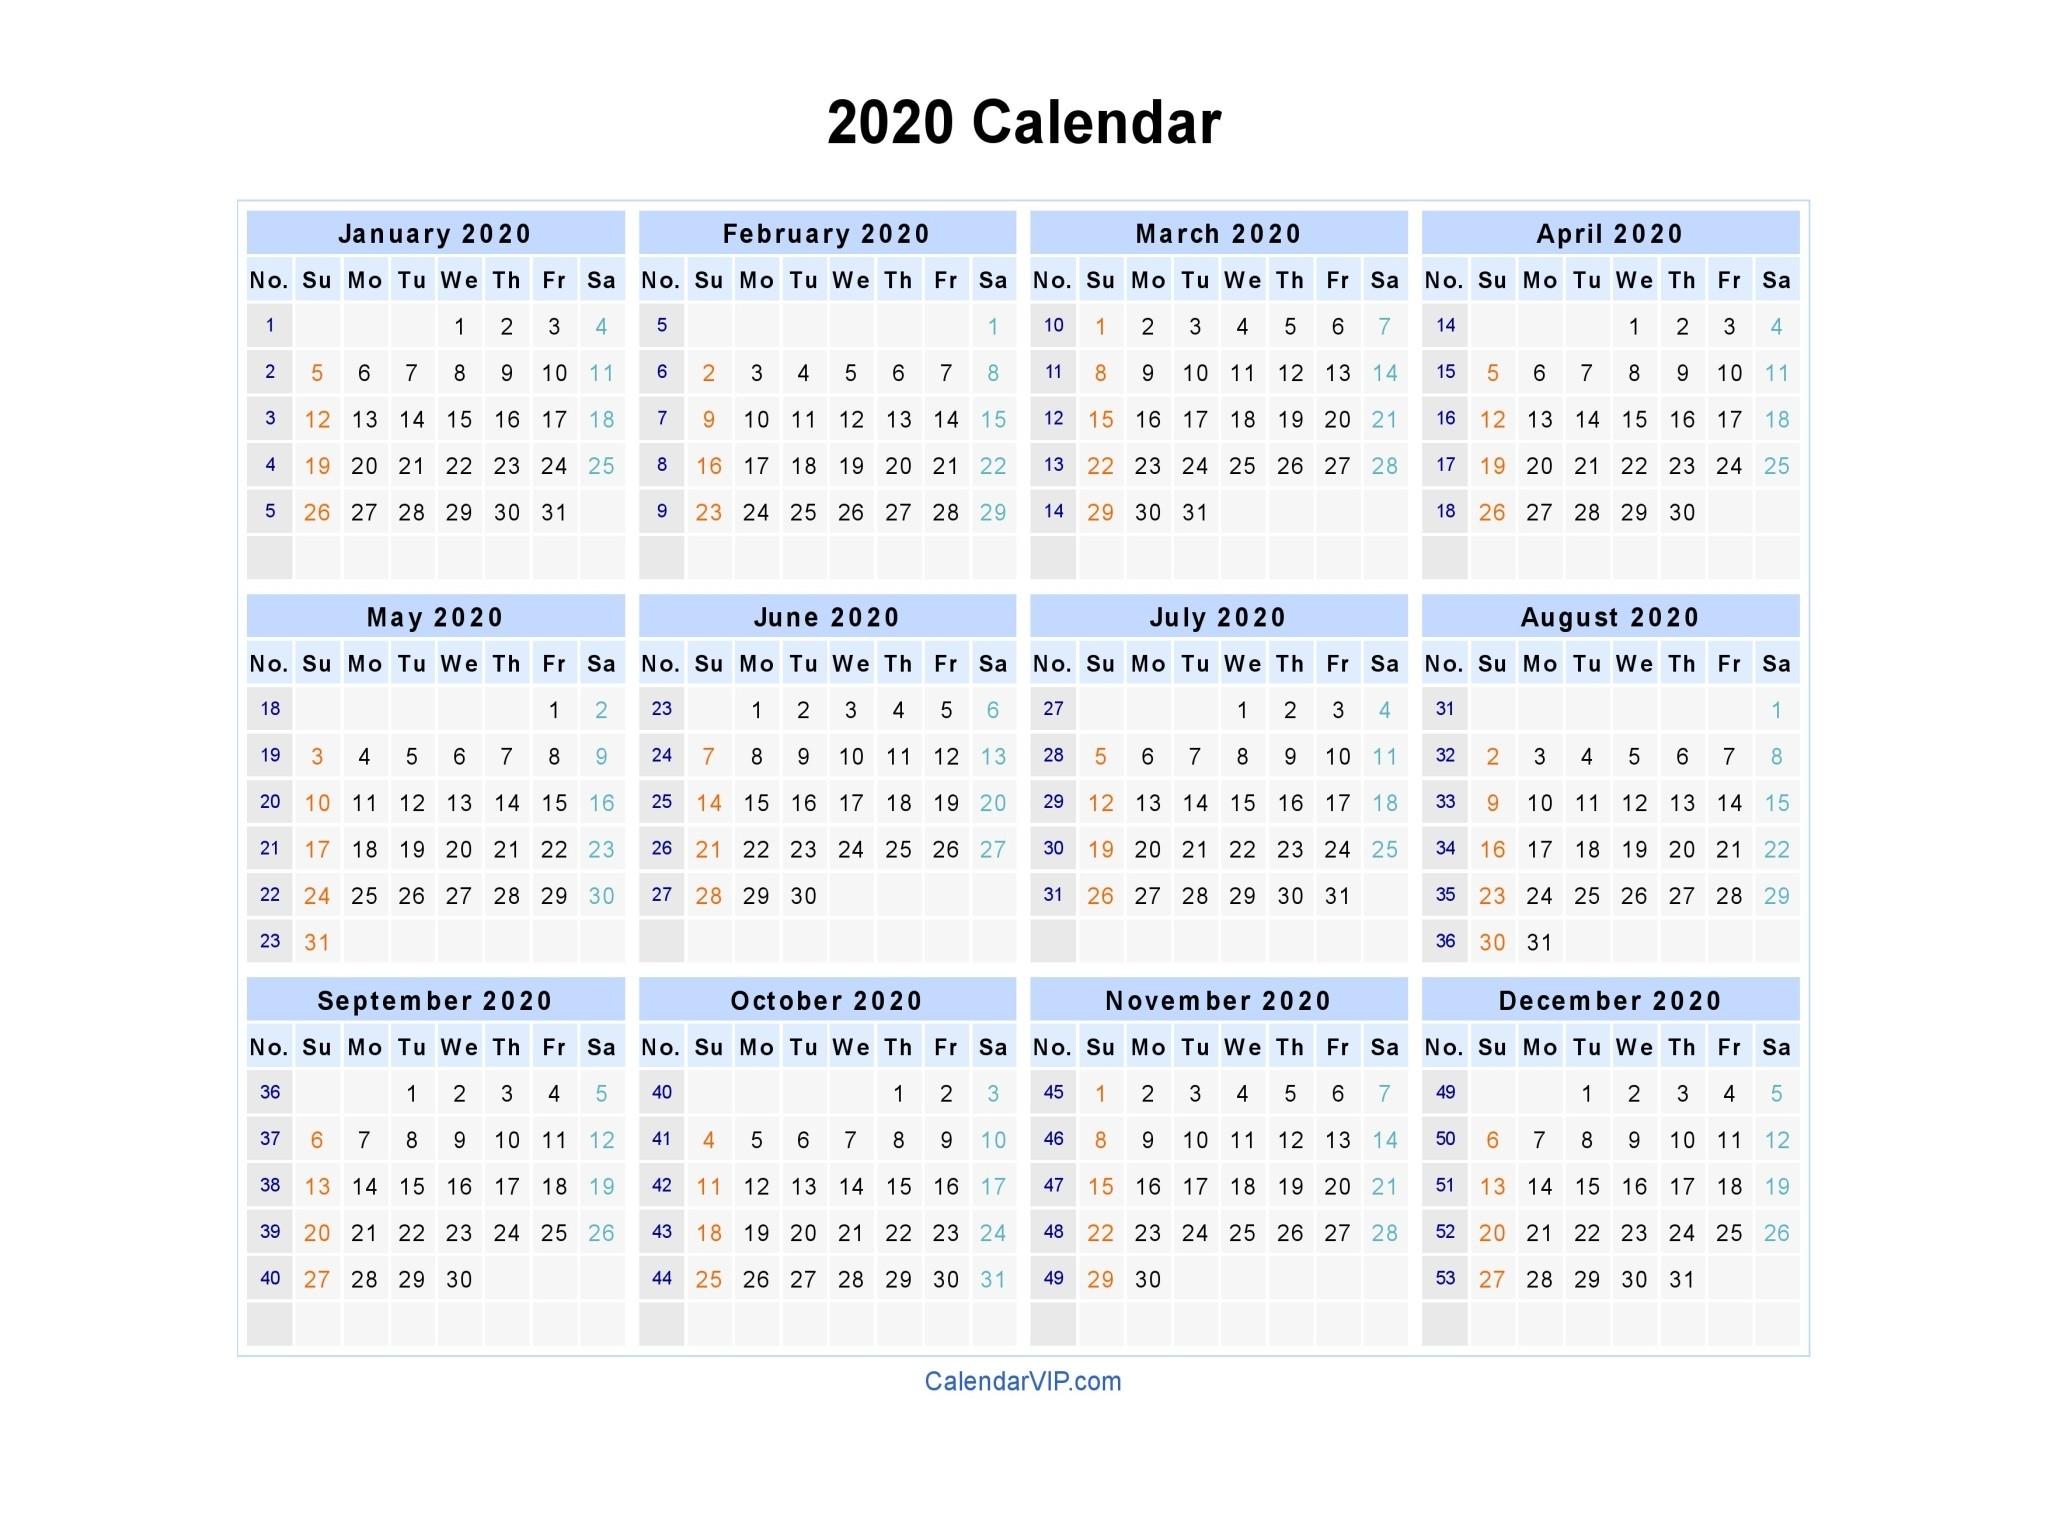 2020 Calendar - Blank Printable Calendar Template In Pdf-Microsoft Calendar Templates 2020